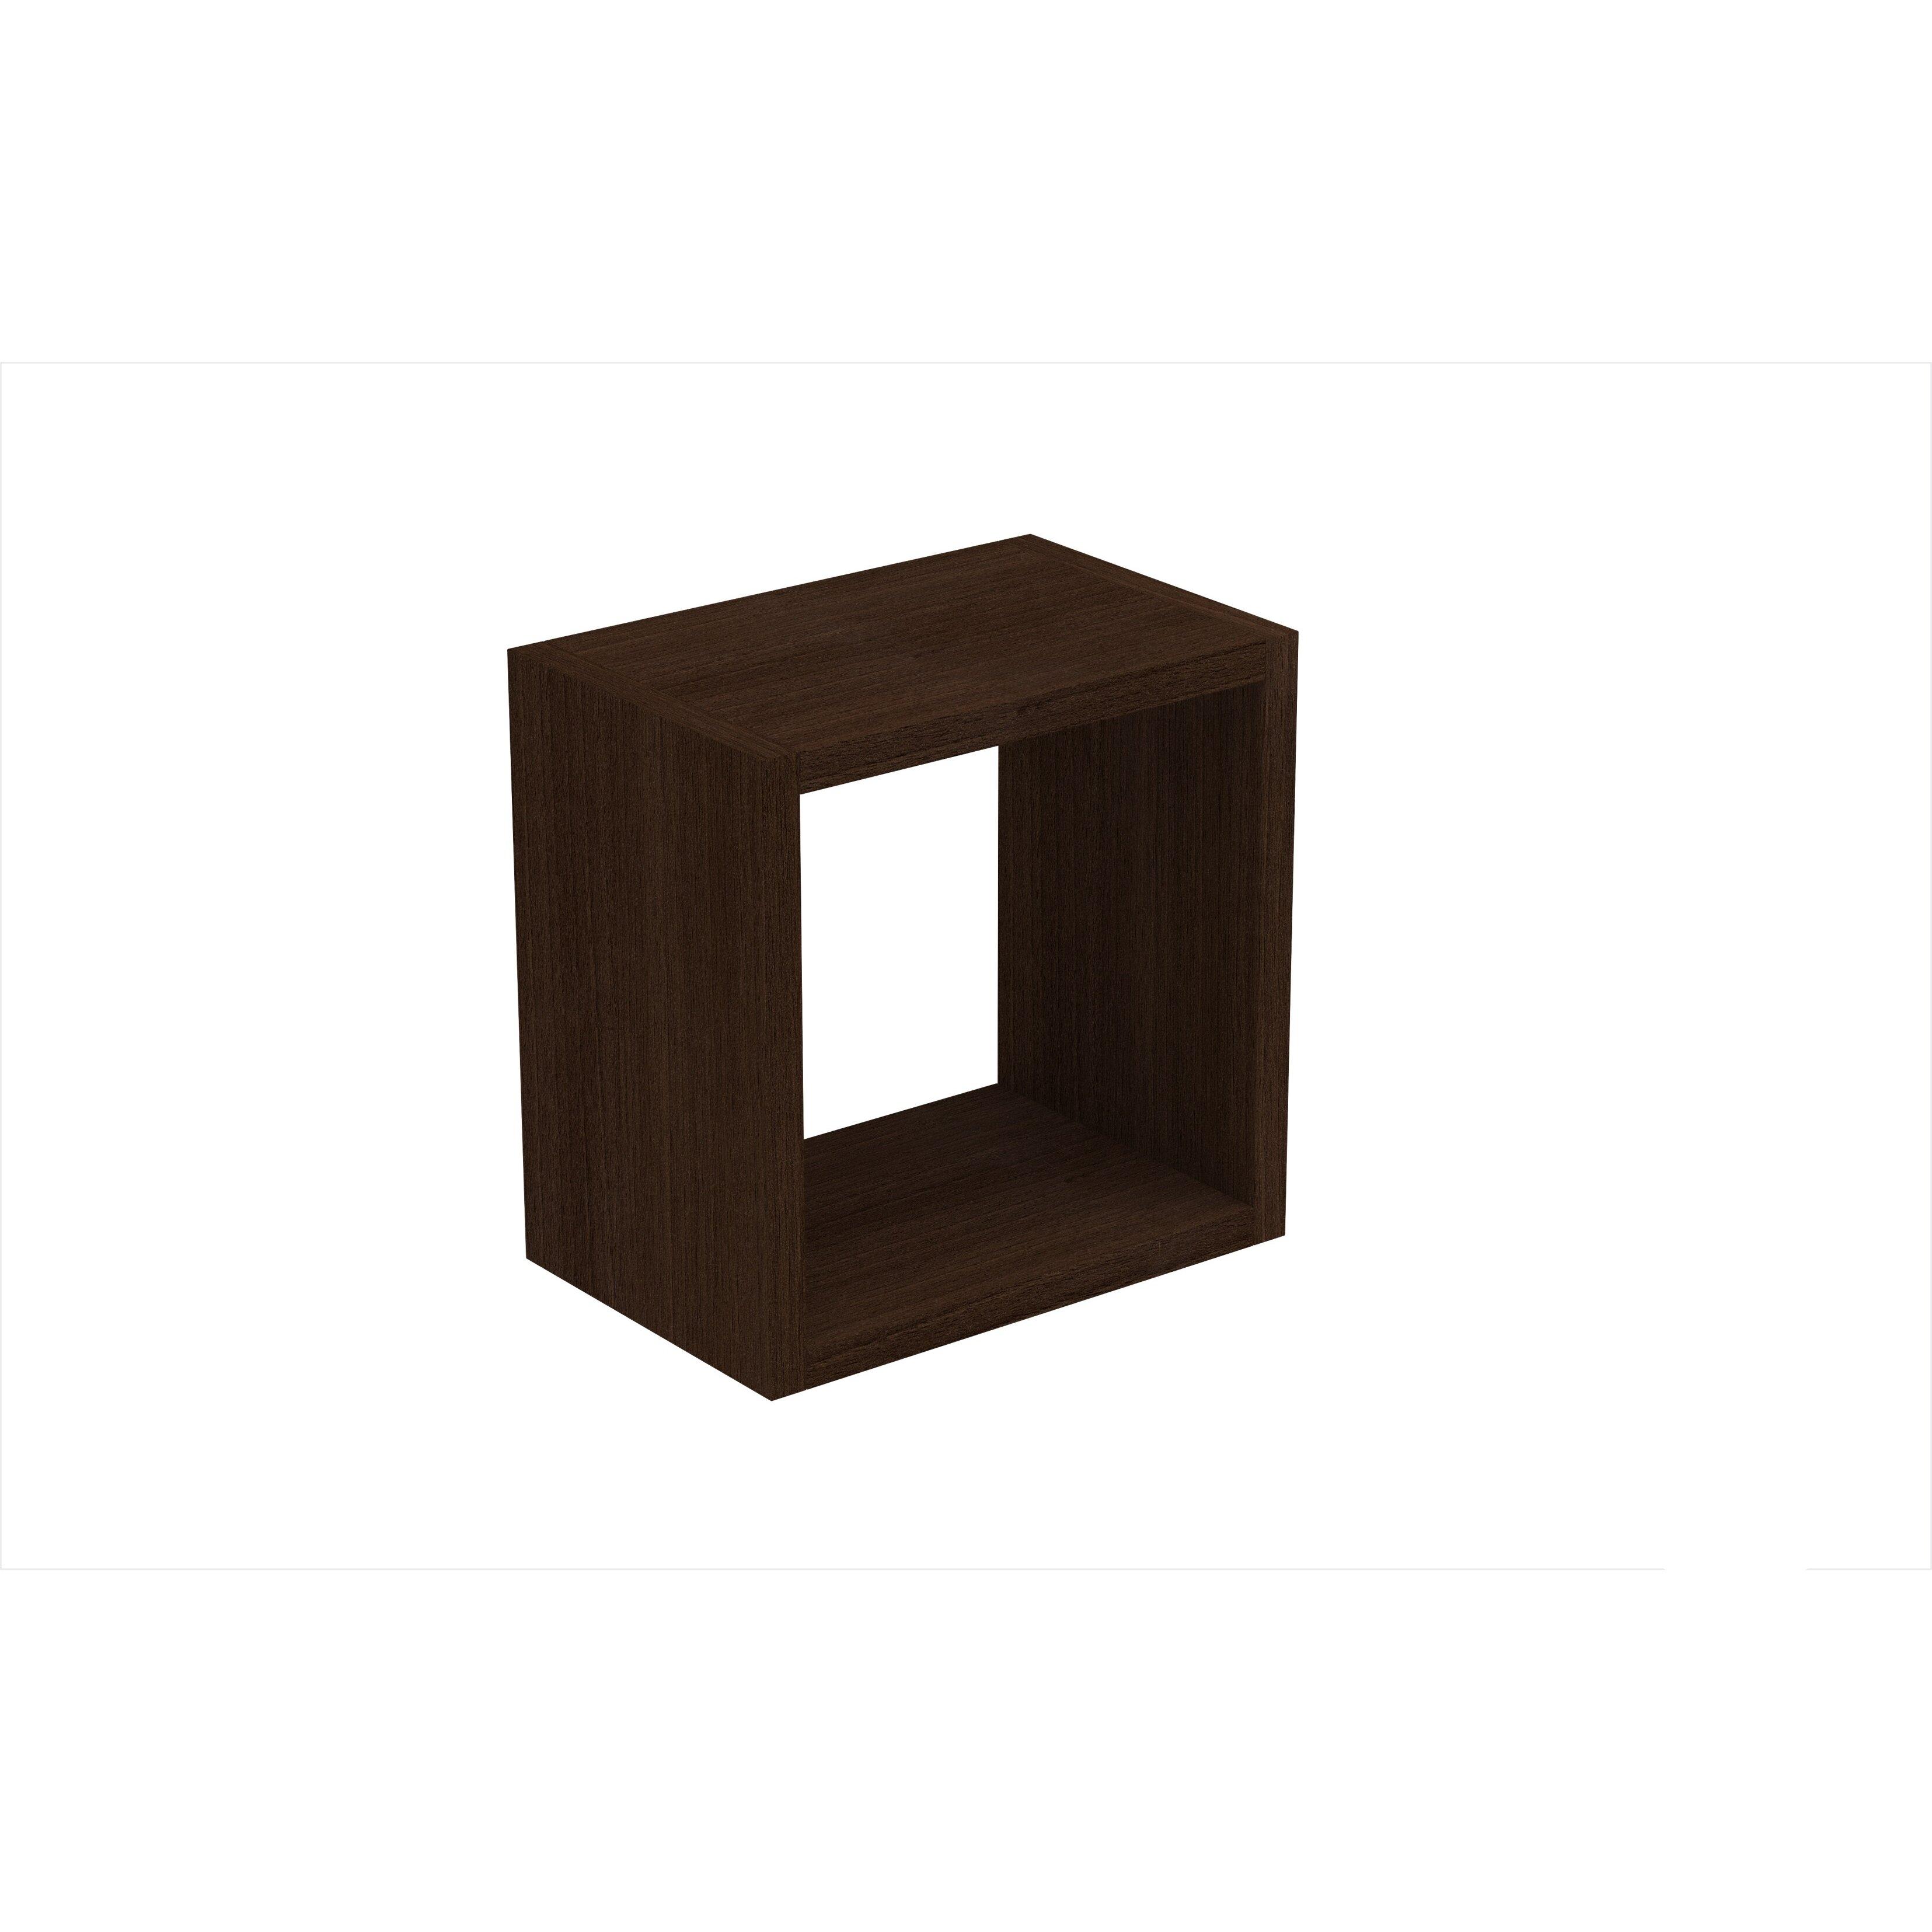 Image Result For White Floating Shelves For Sale